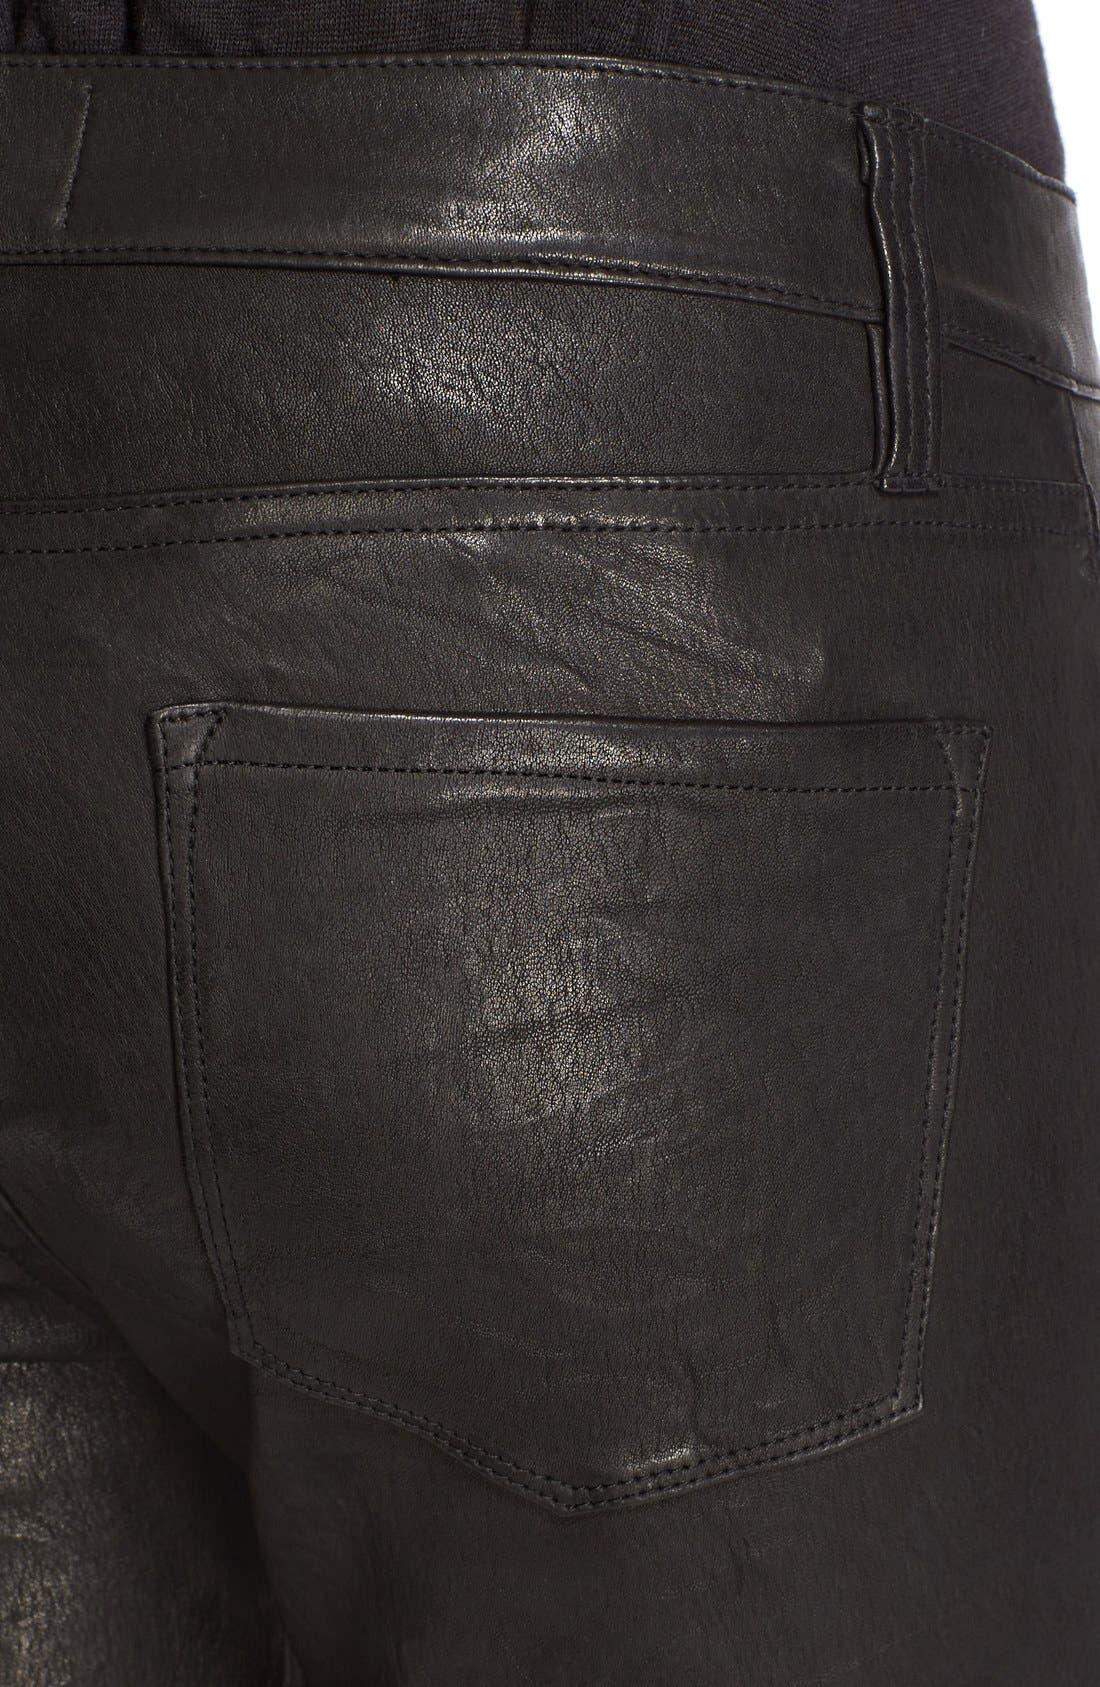 'Le Skinny' Lambskin Leather Pants,                             Alternate thumbnail 4, color,                             WASHED BLACK